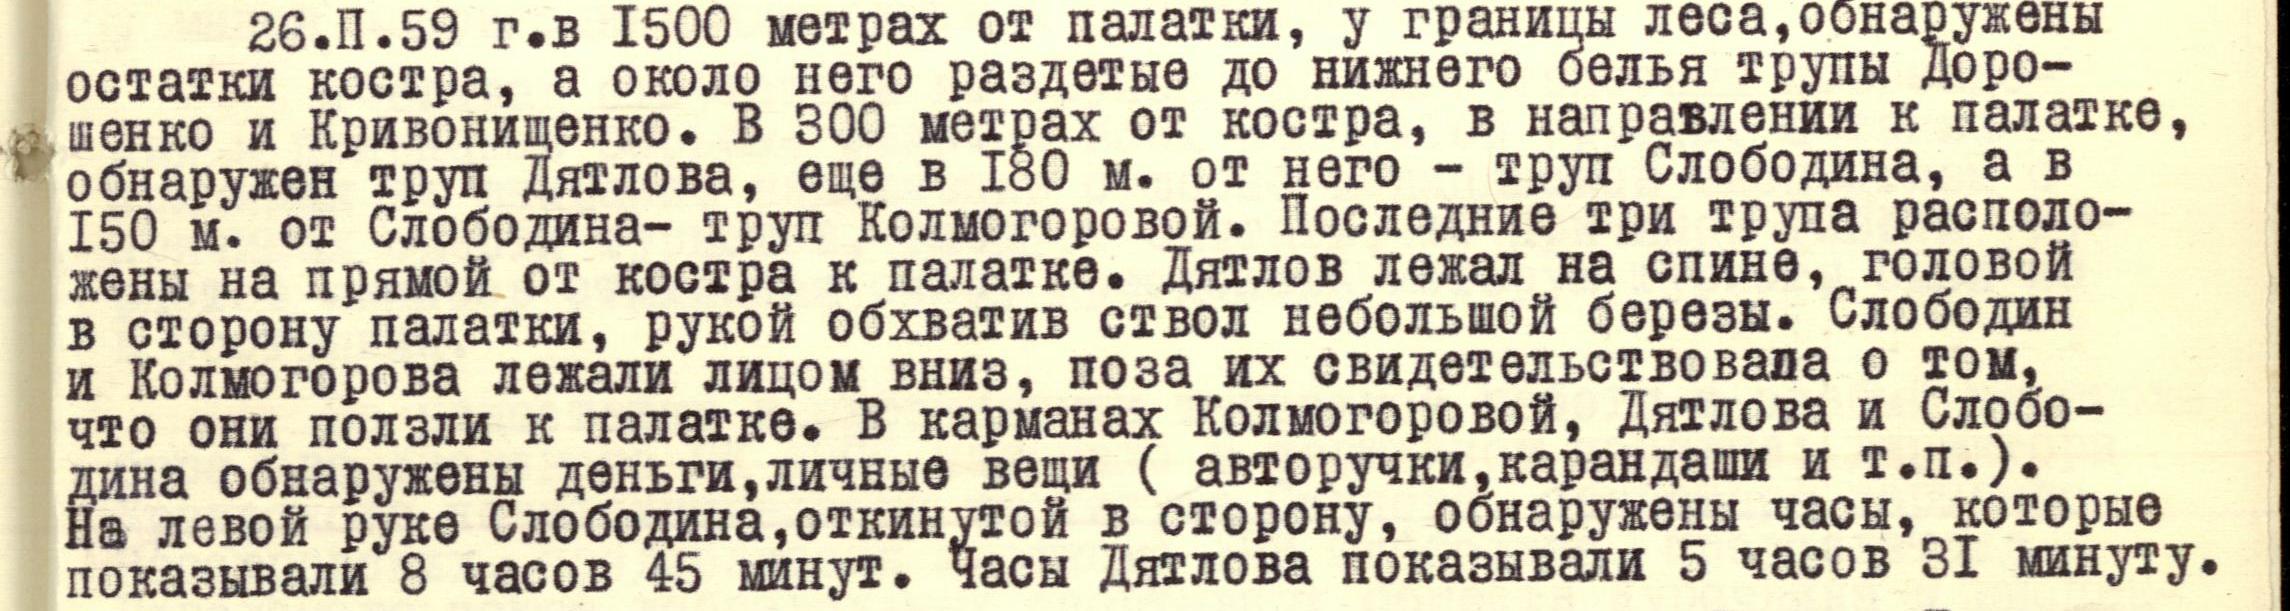 http://s2.uploads.ru/KIjoC.jpg